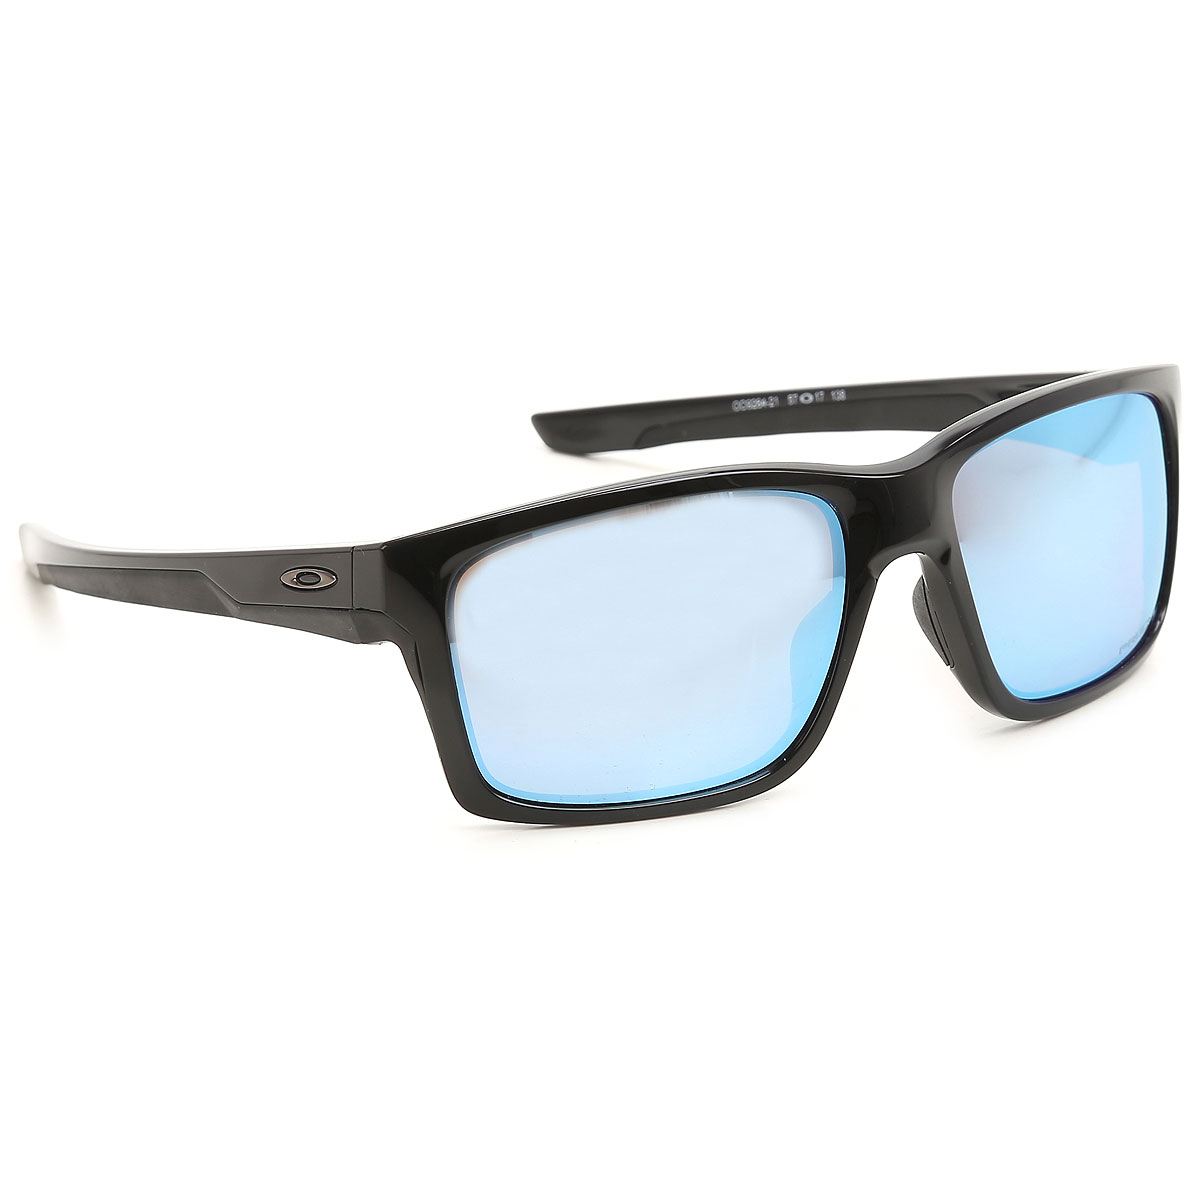 Image of Oakley Sunglasses On Sale, Black, 2017